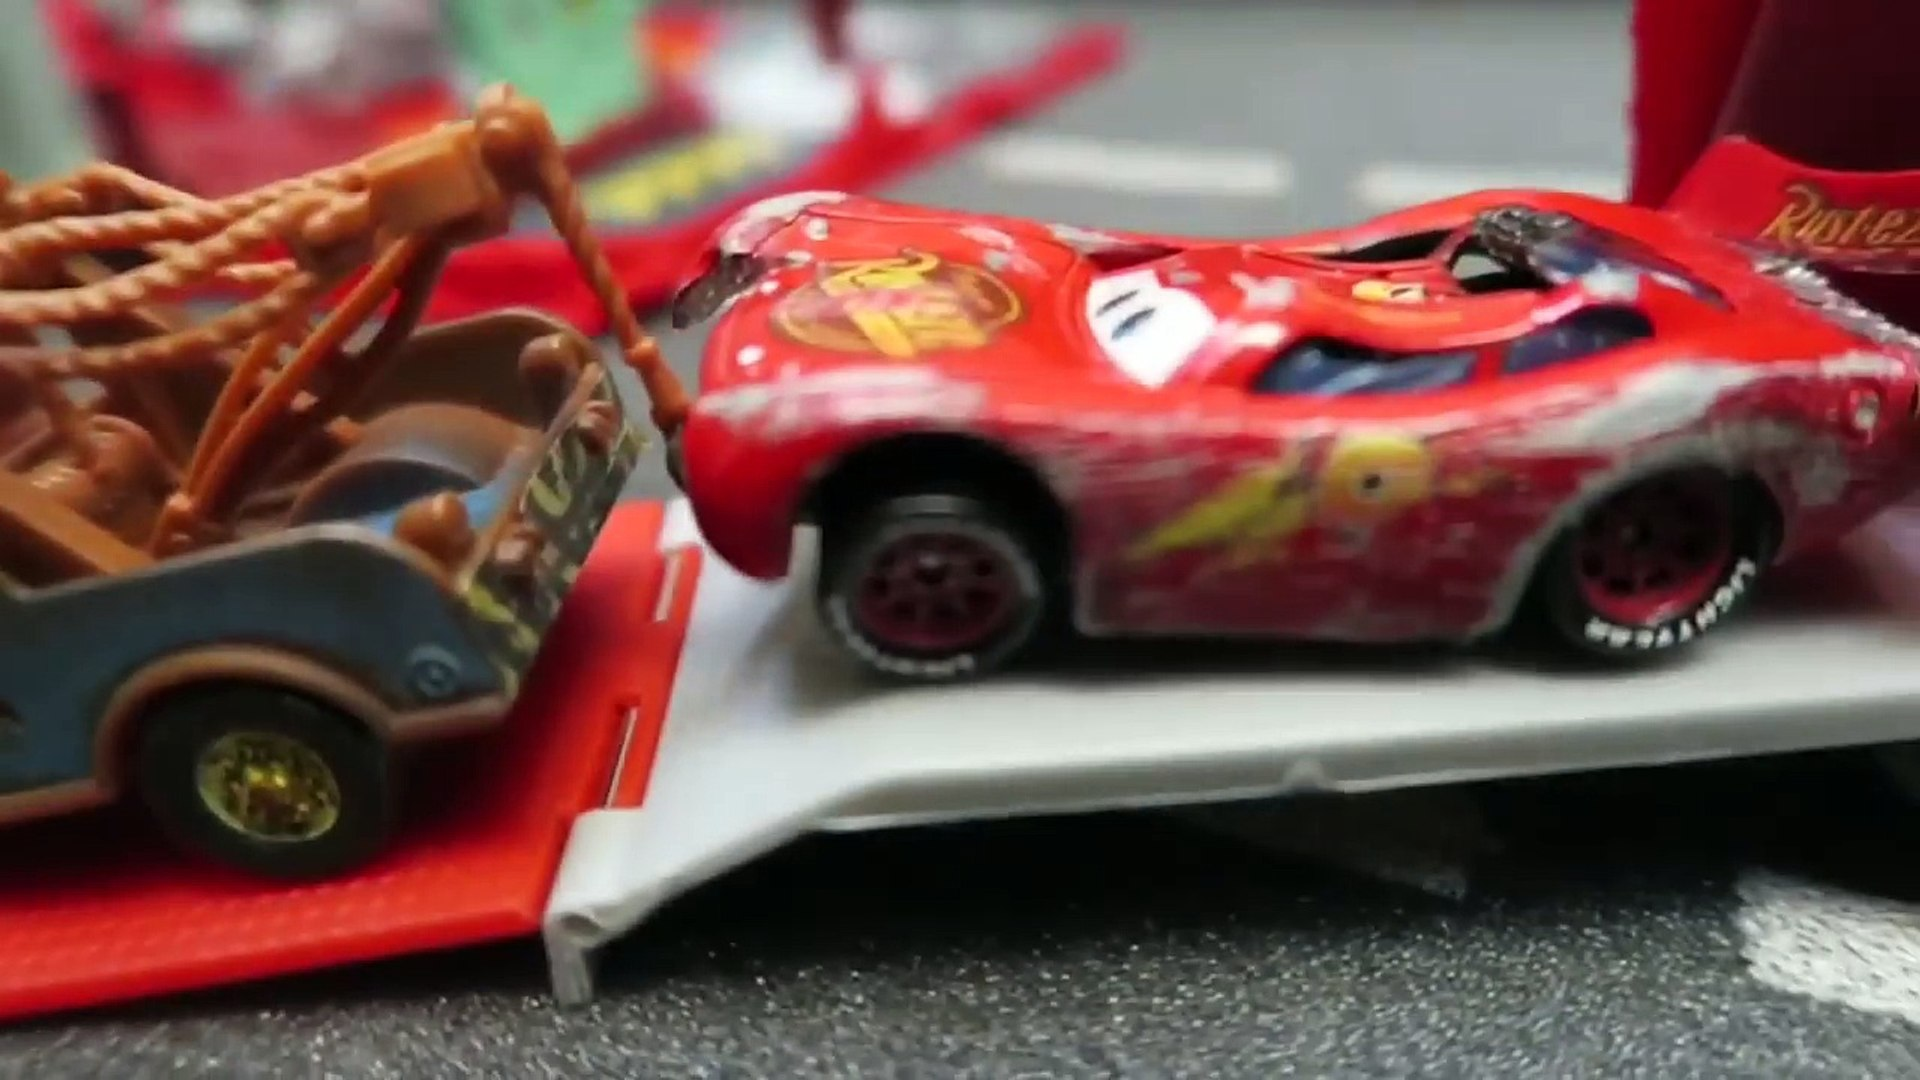 Cars 3 Lightning Mcqueen Crash Scene Body Repair Next Gen Piston Cup Racers Ruseze In Movi Video Dailymotion